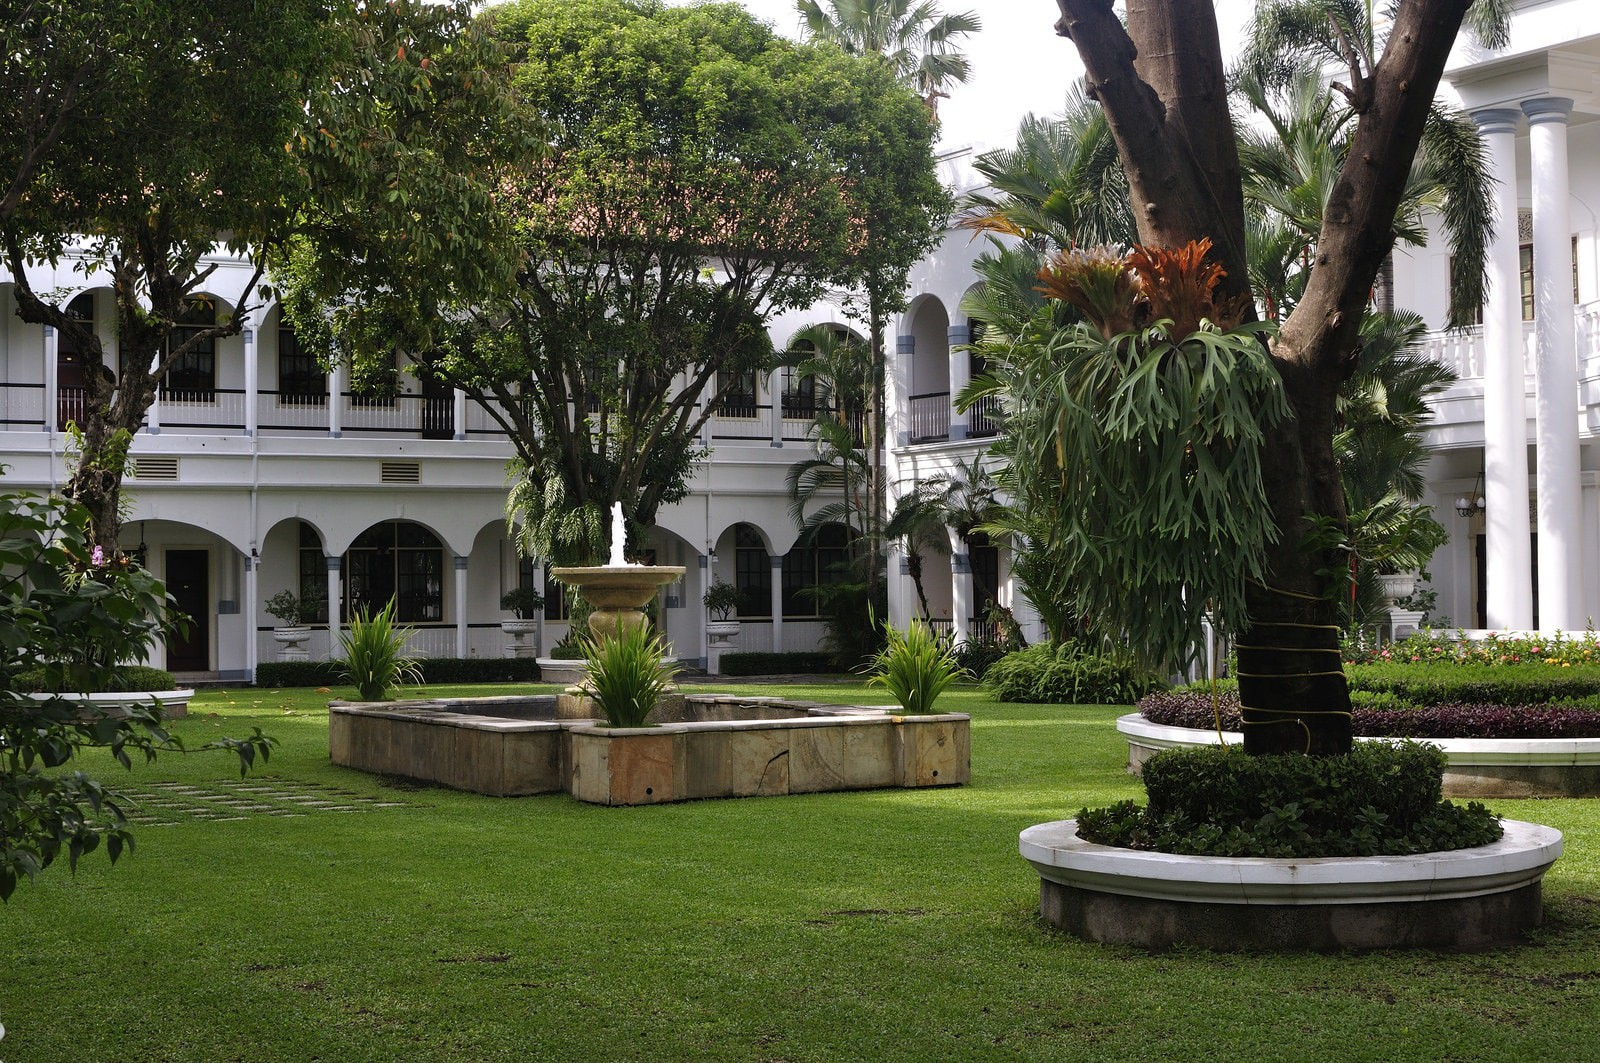 Majapahit Hotel, a historical landmark in Surabaya